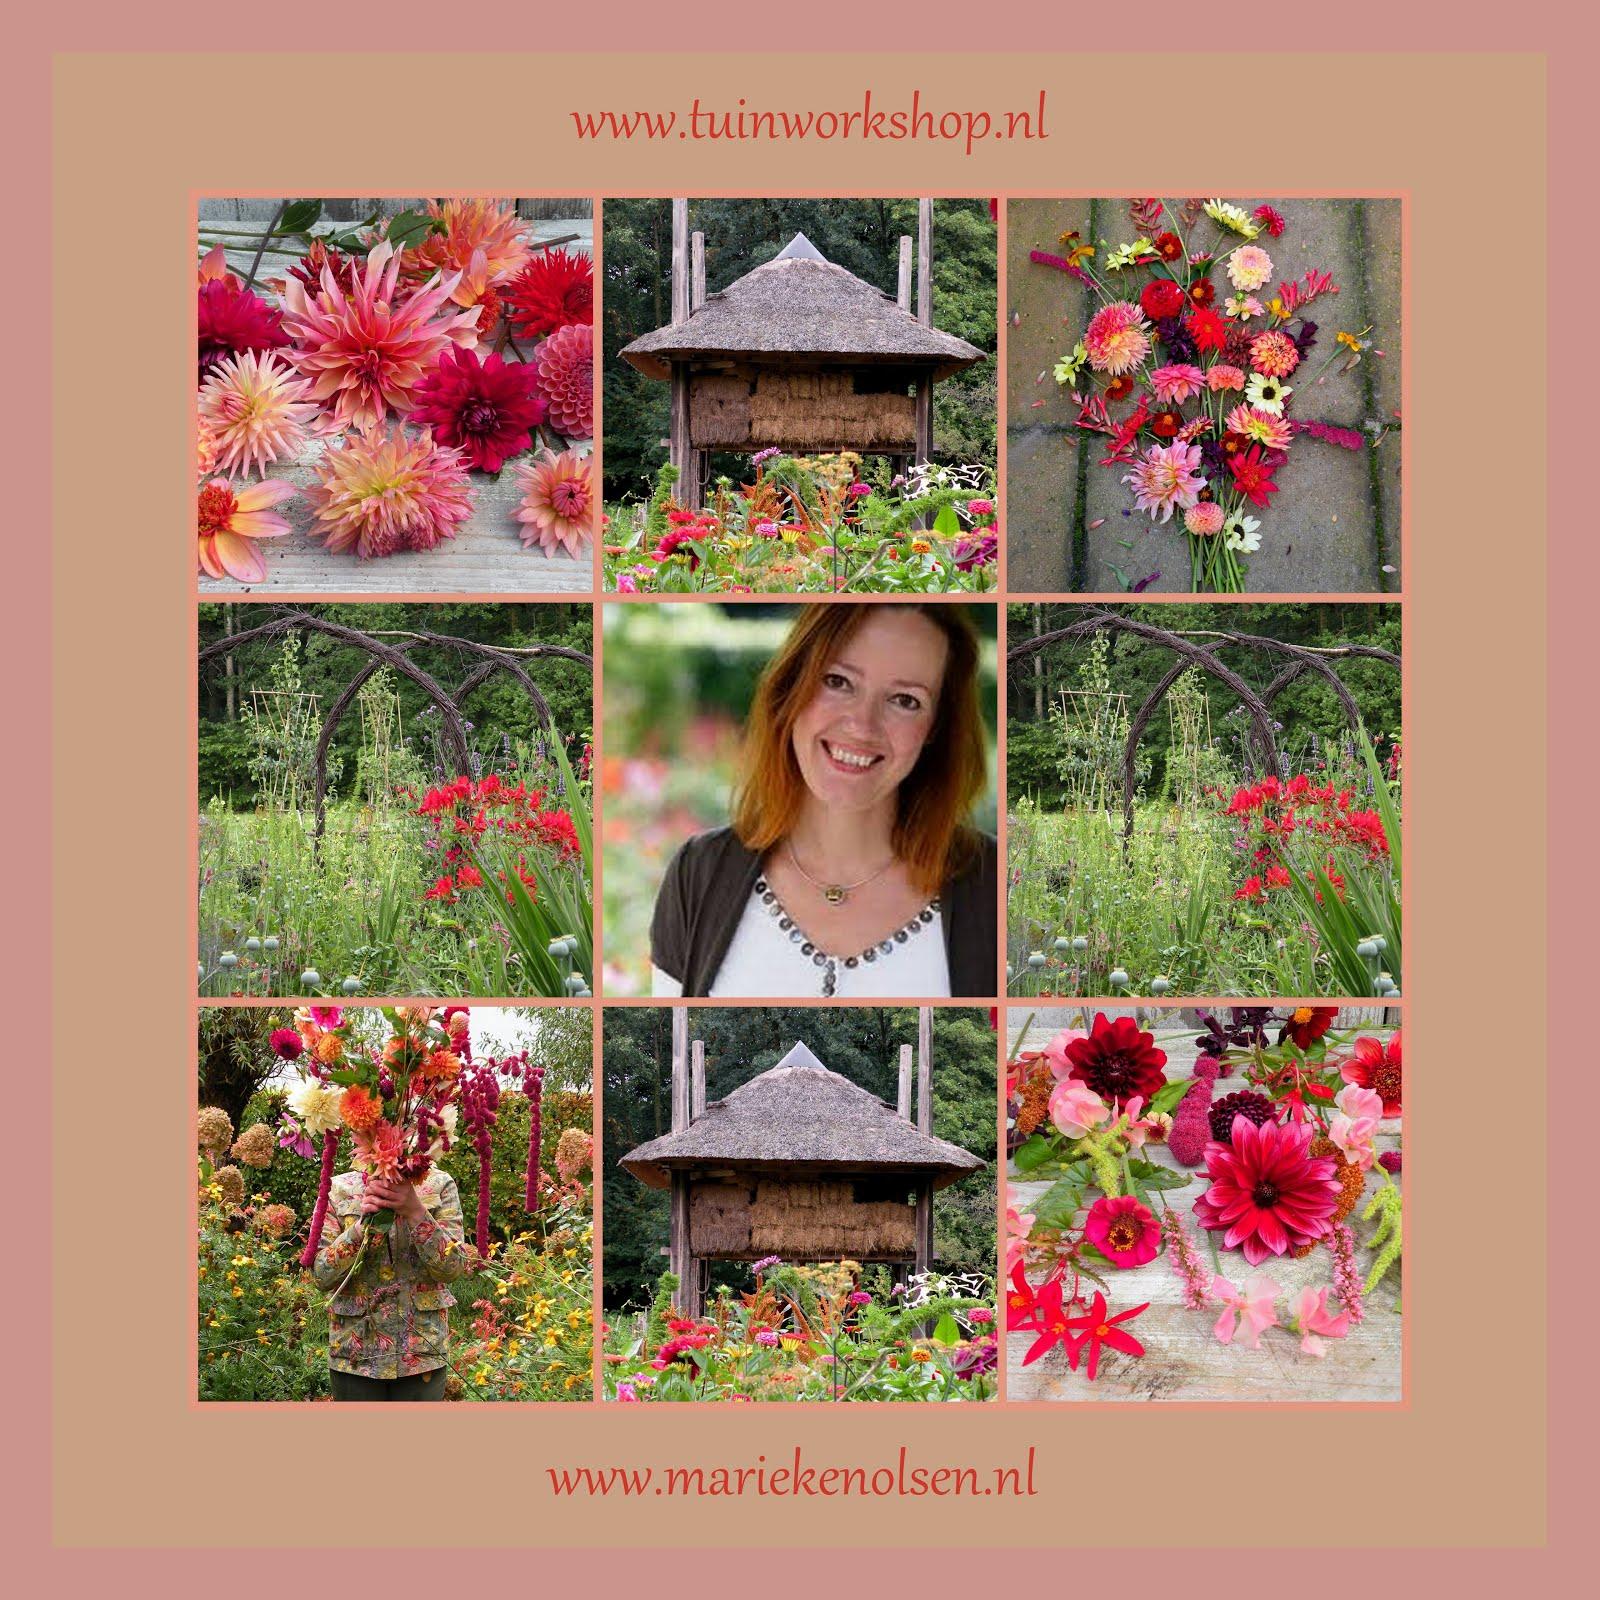 Tuinworkshop: Bloemen Pluktuin